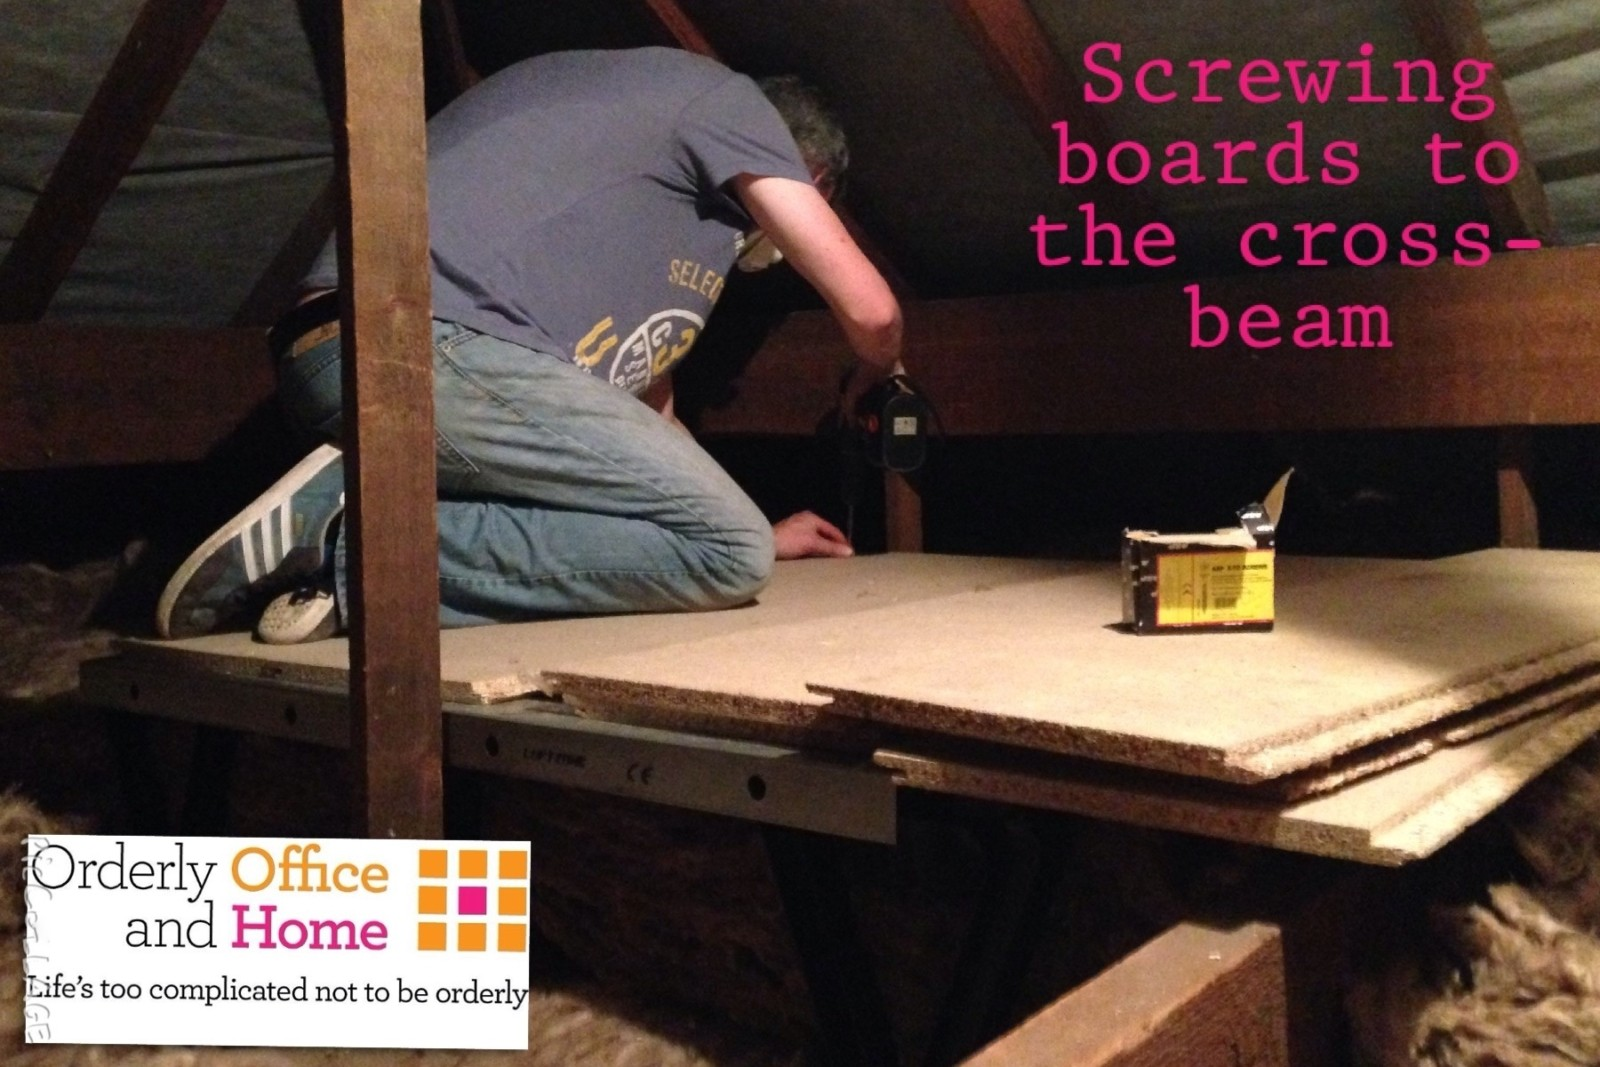 Screwing boards to Loft Zone cross-beams